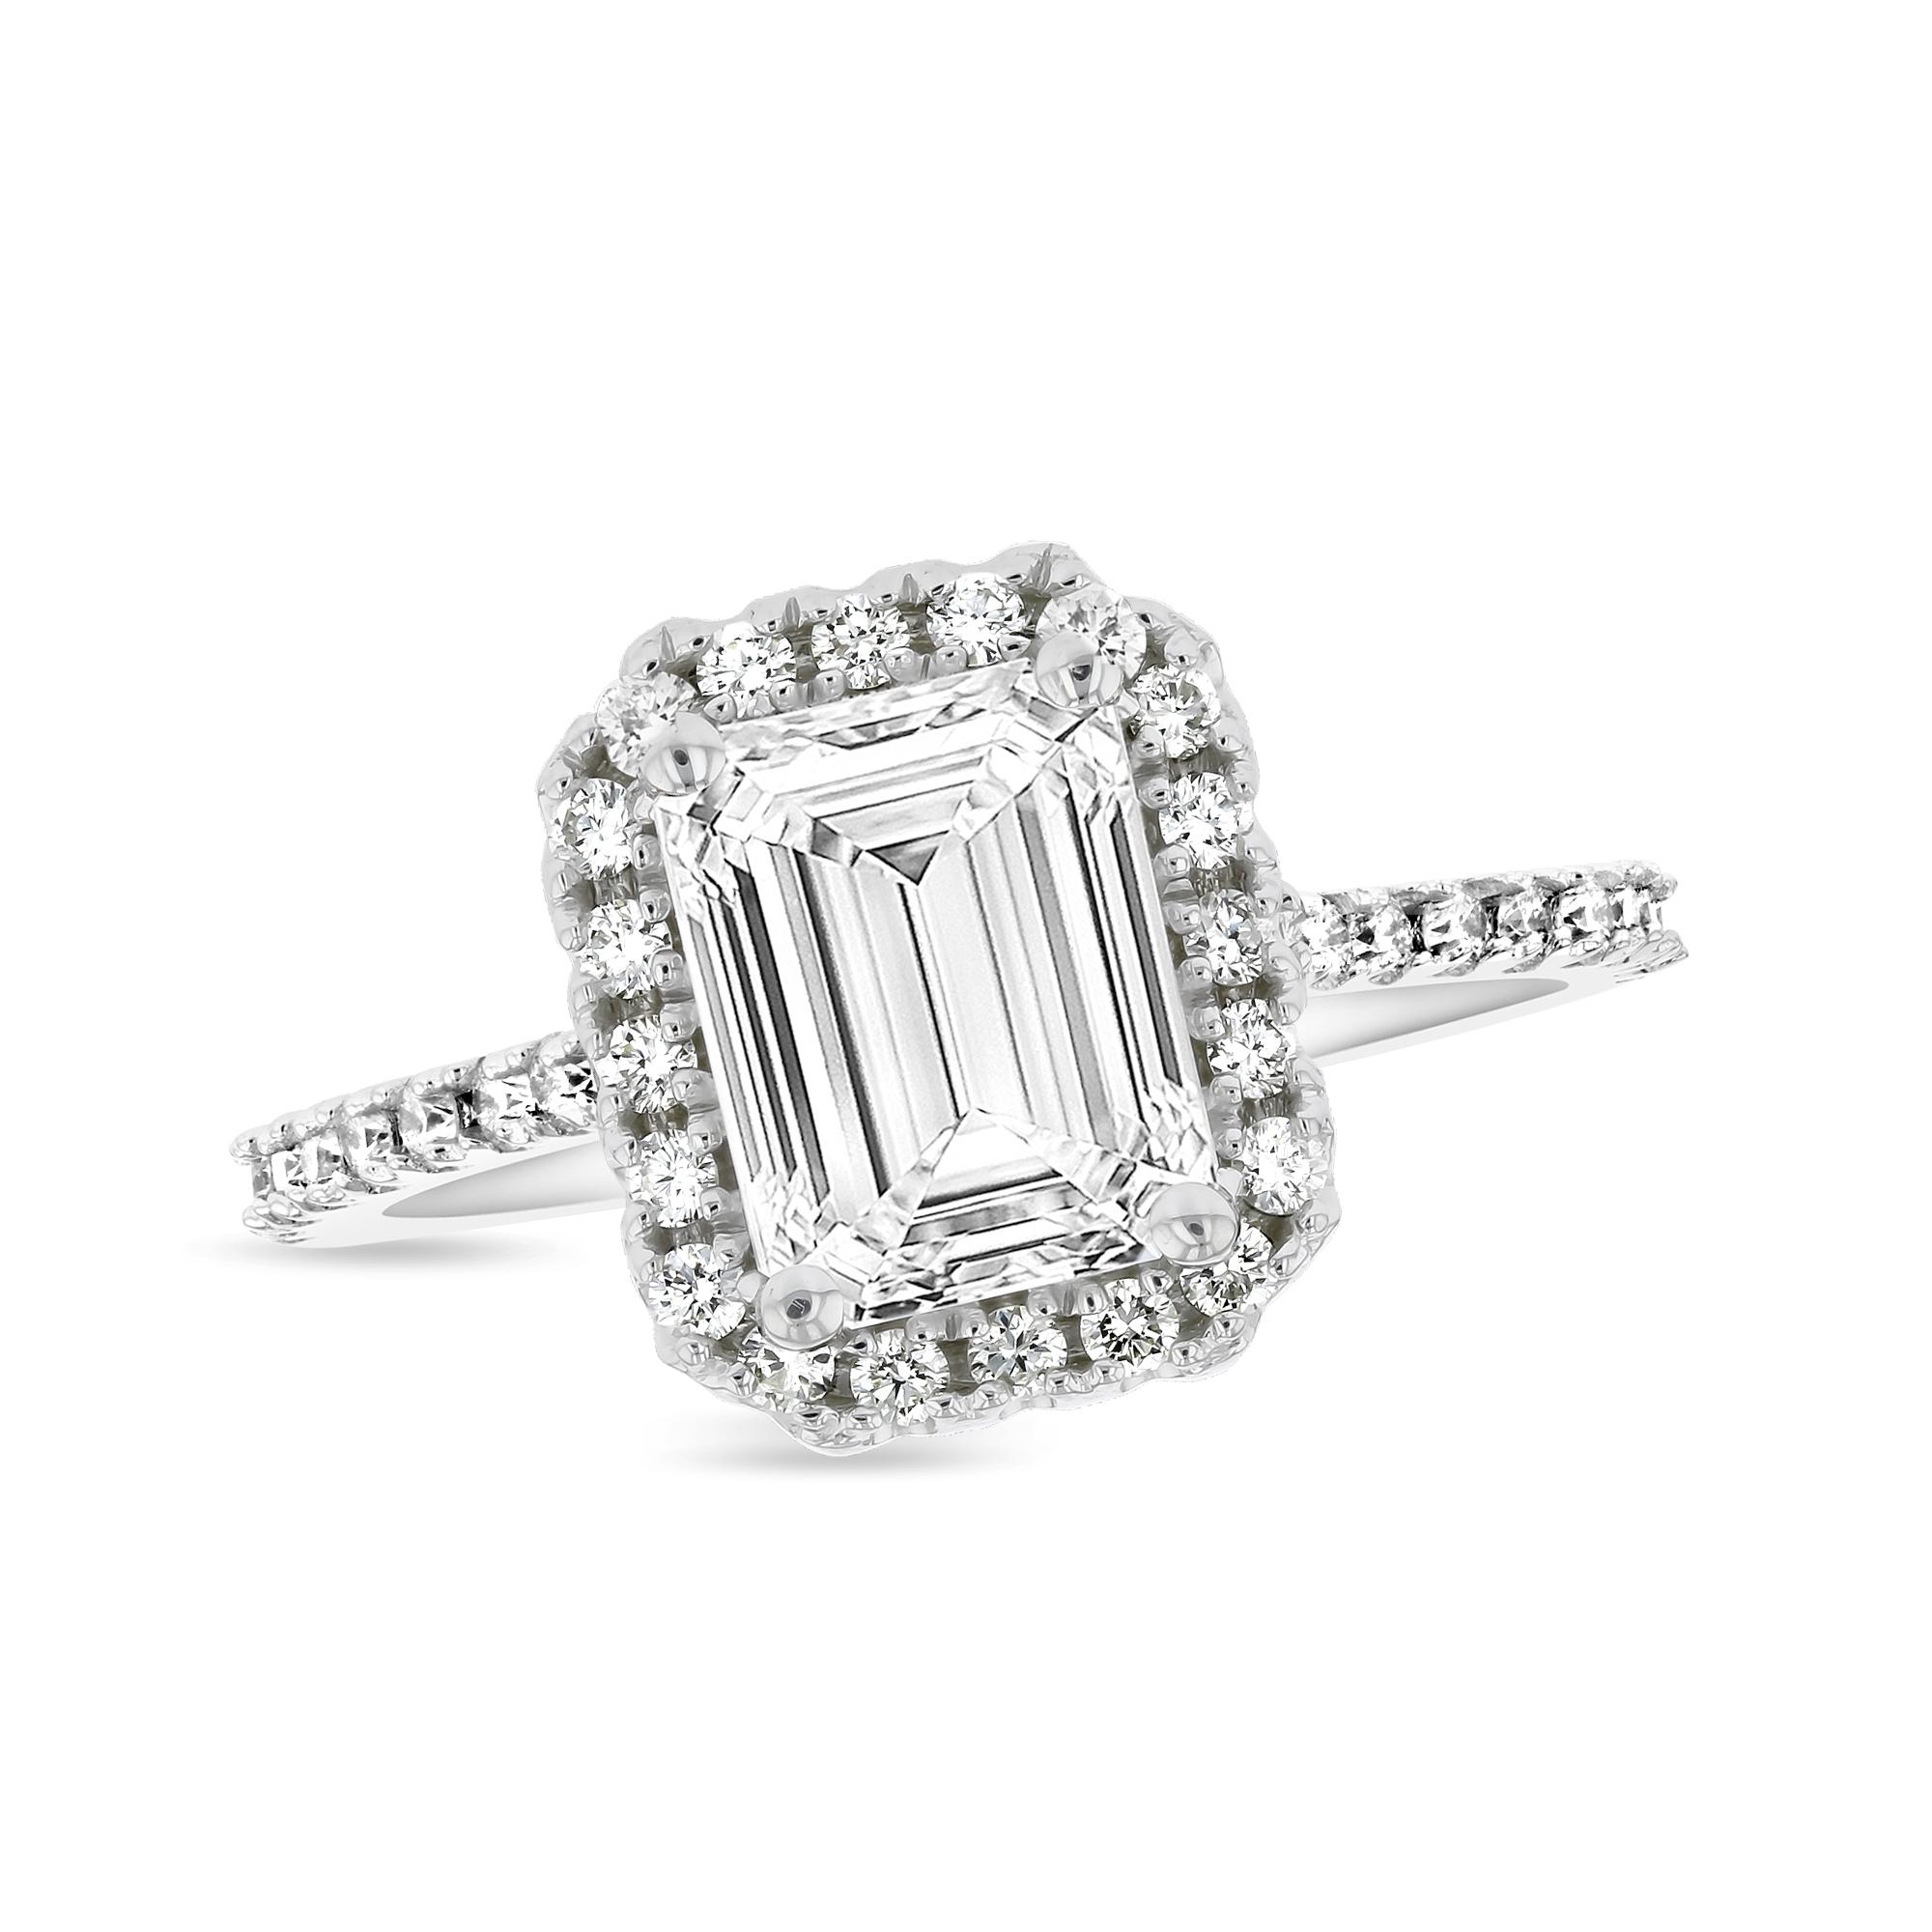 View 0.50ctw Diamond Emerald Cut Halo Semi Mount Ring in 14k White Gold